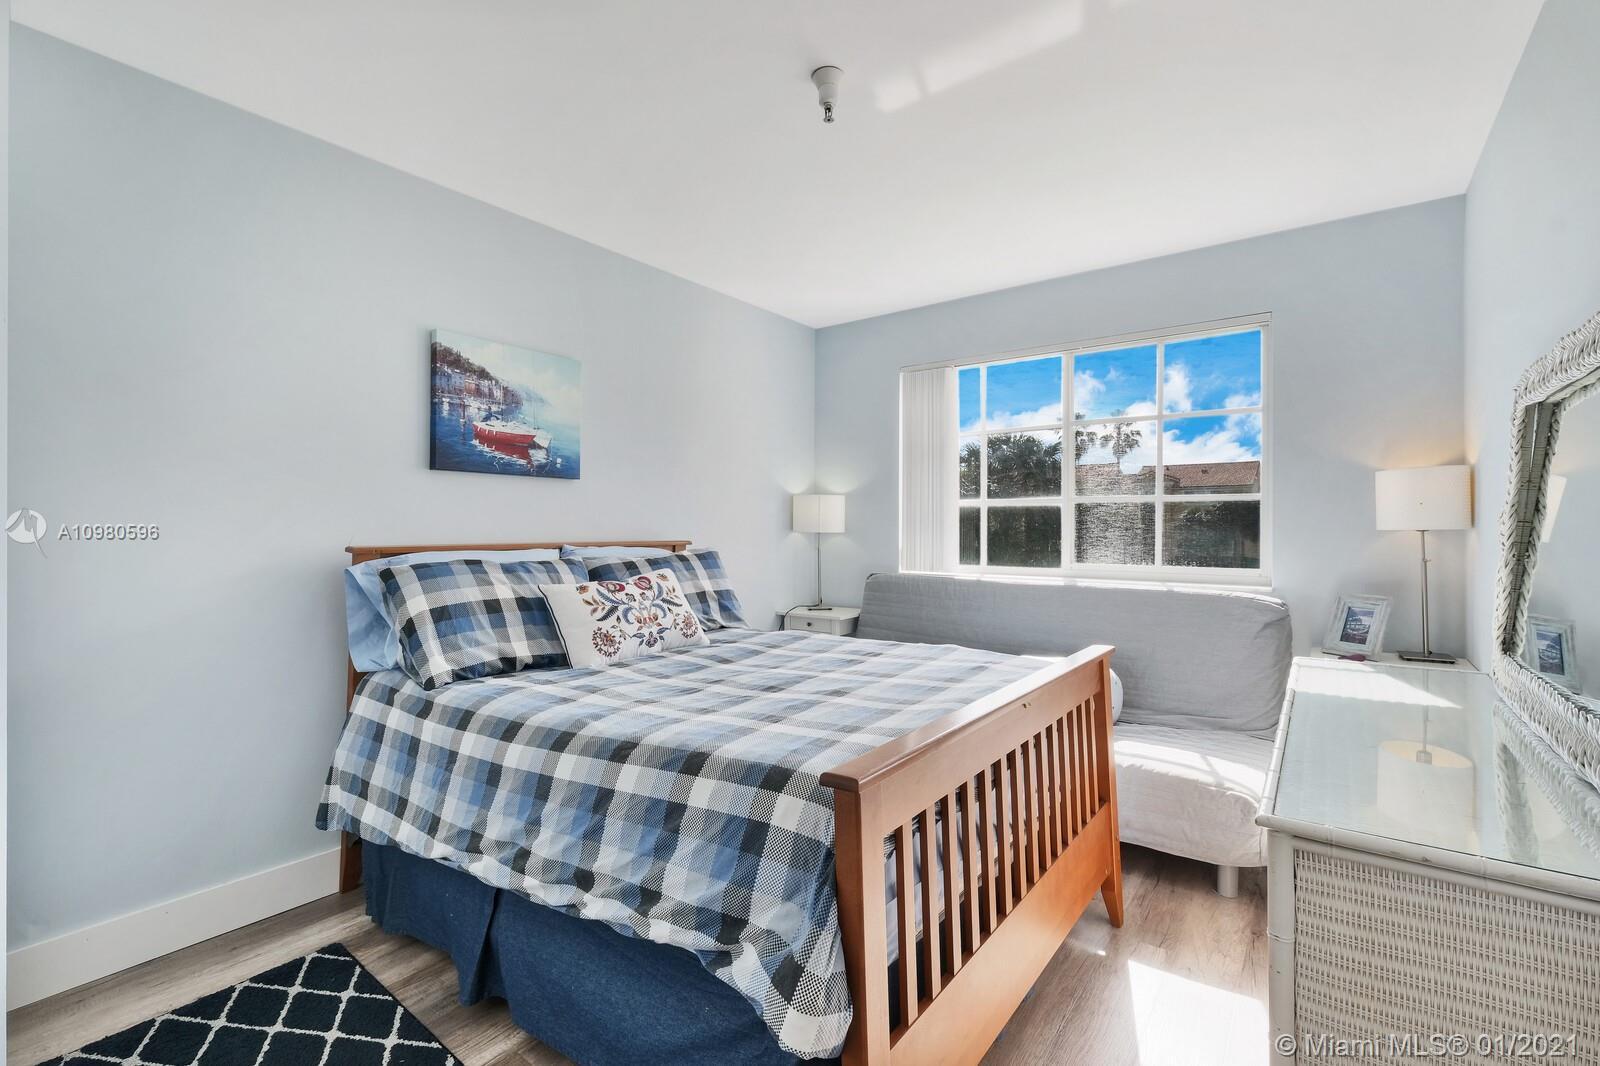 145 Yacht Club Way # 212, Hypoluxo, Florida 33462, 2 Bedrooms Bedrooms, ,1 BathroomBathrooms,Residential,For Sale,145 Yacht Club Way # 212,A10980596